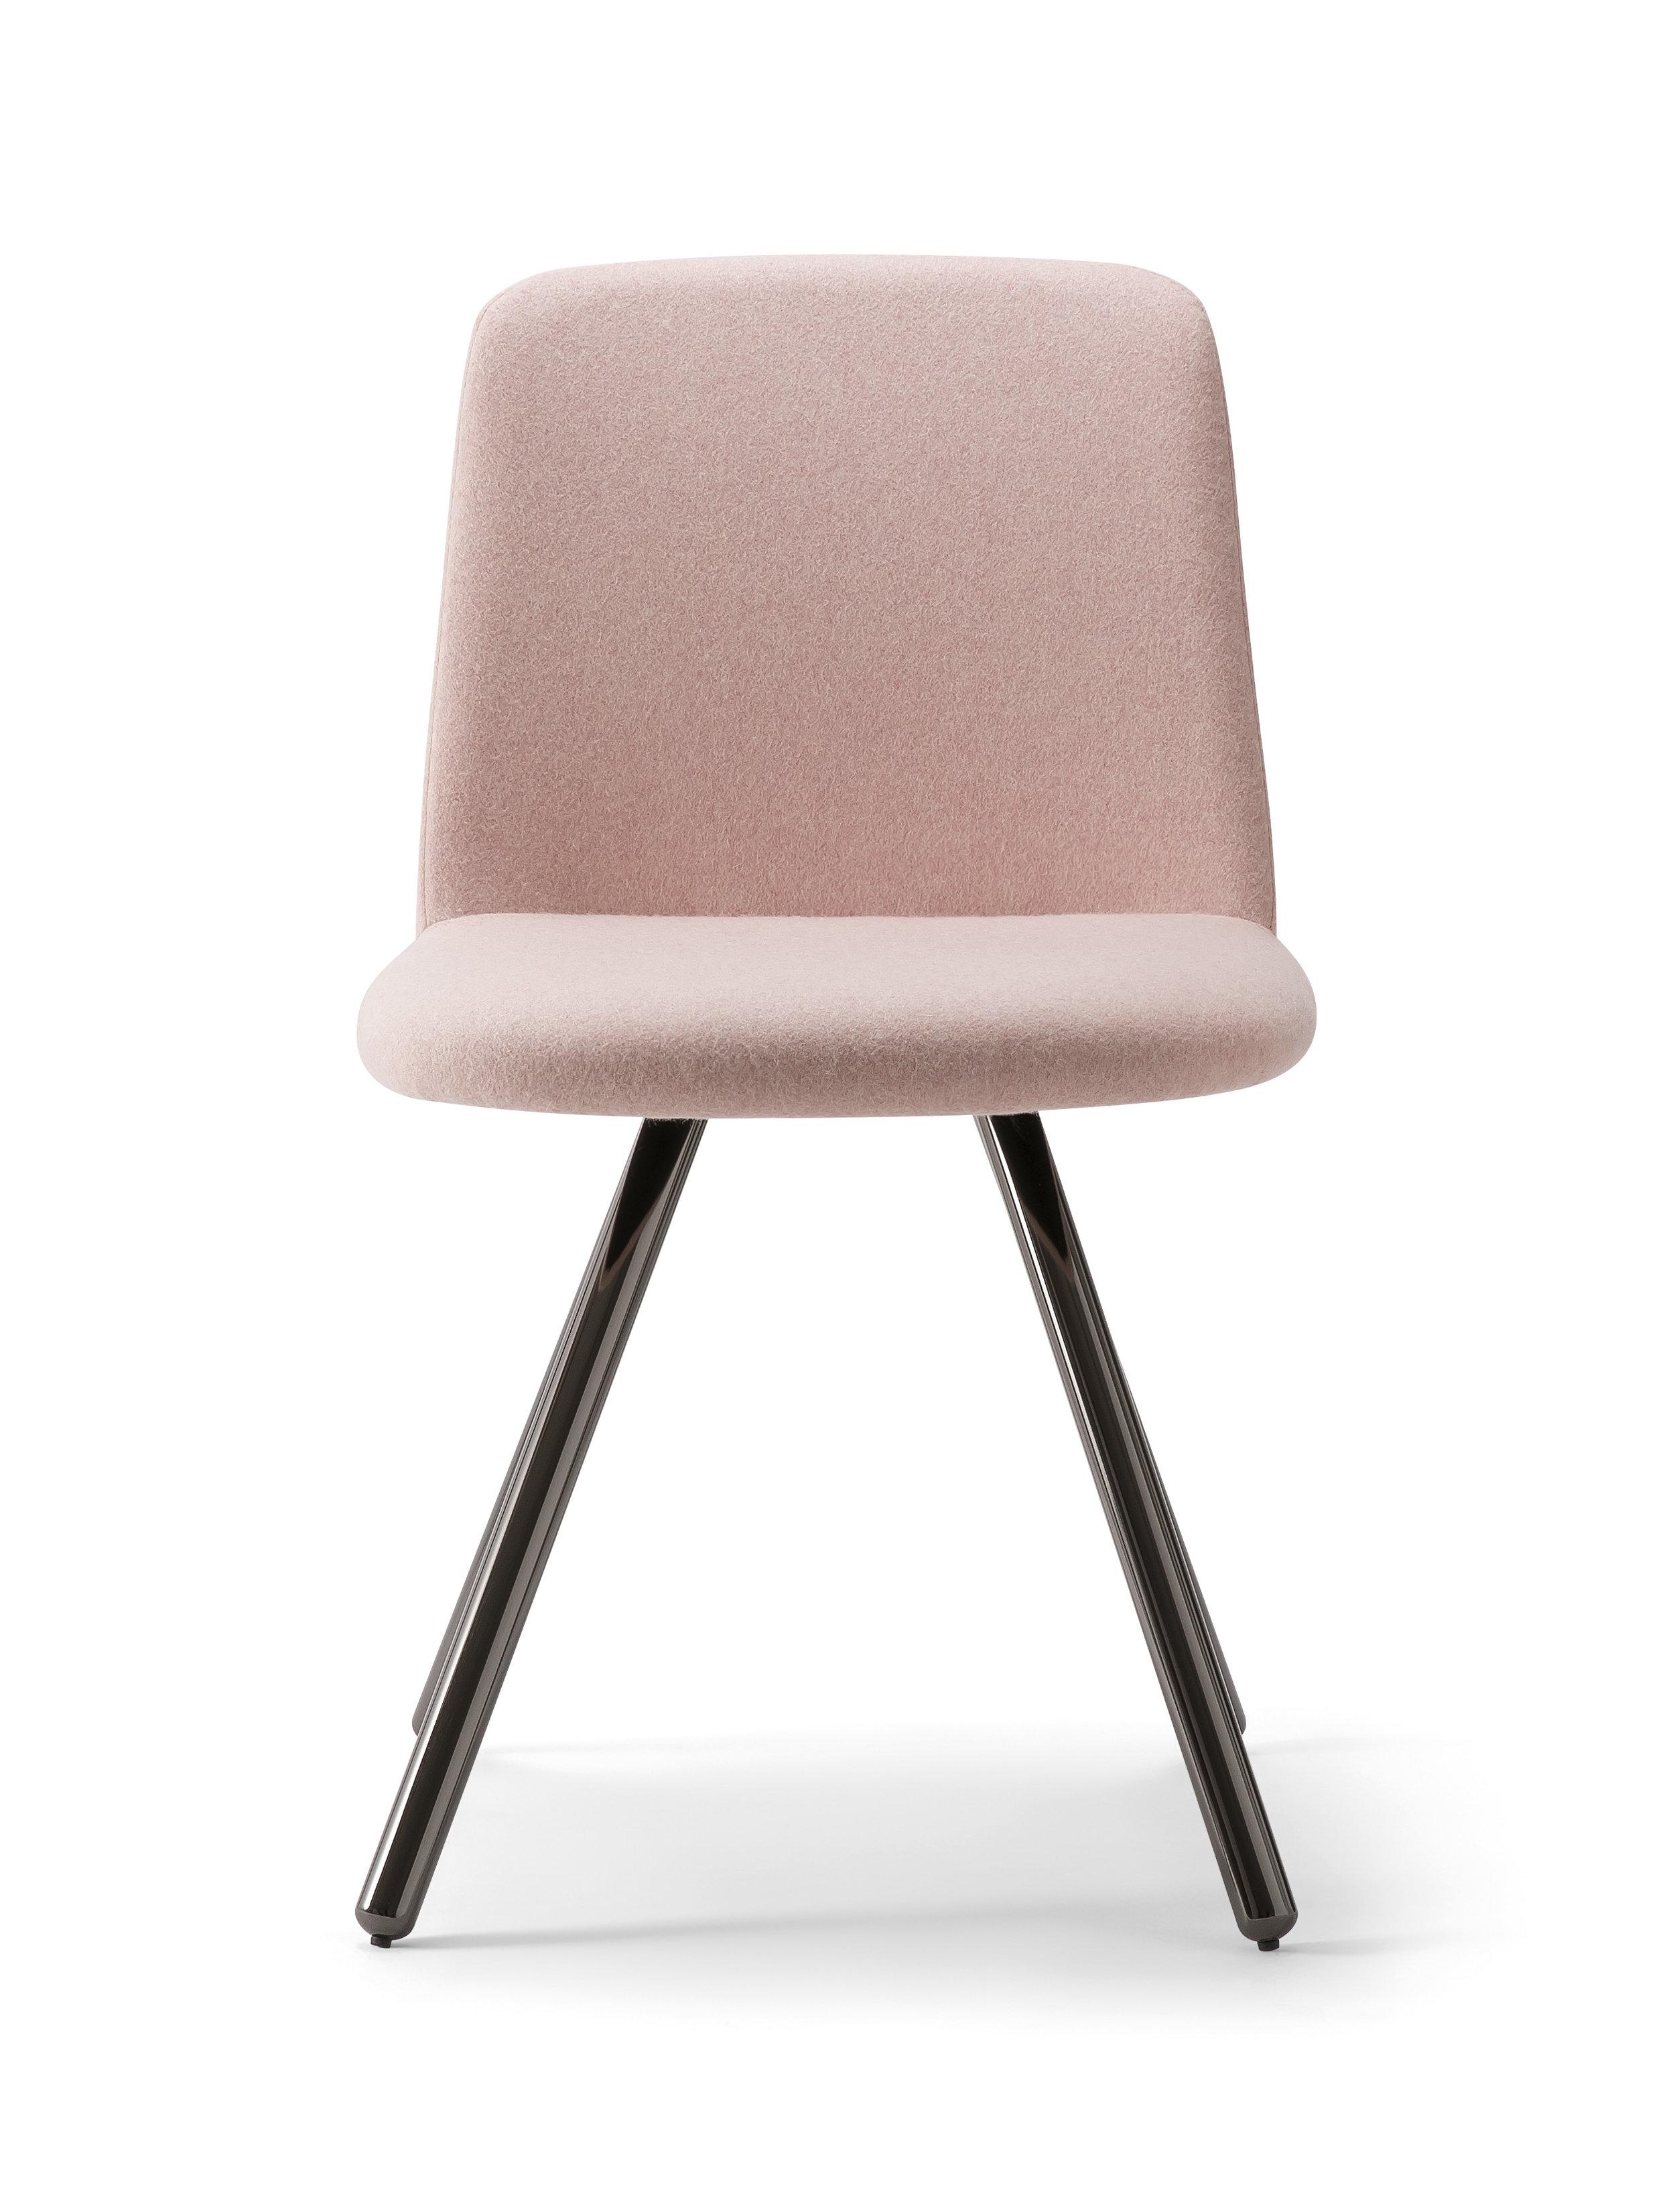 Cloè Chair - Verti SRL